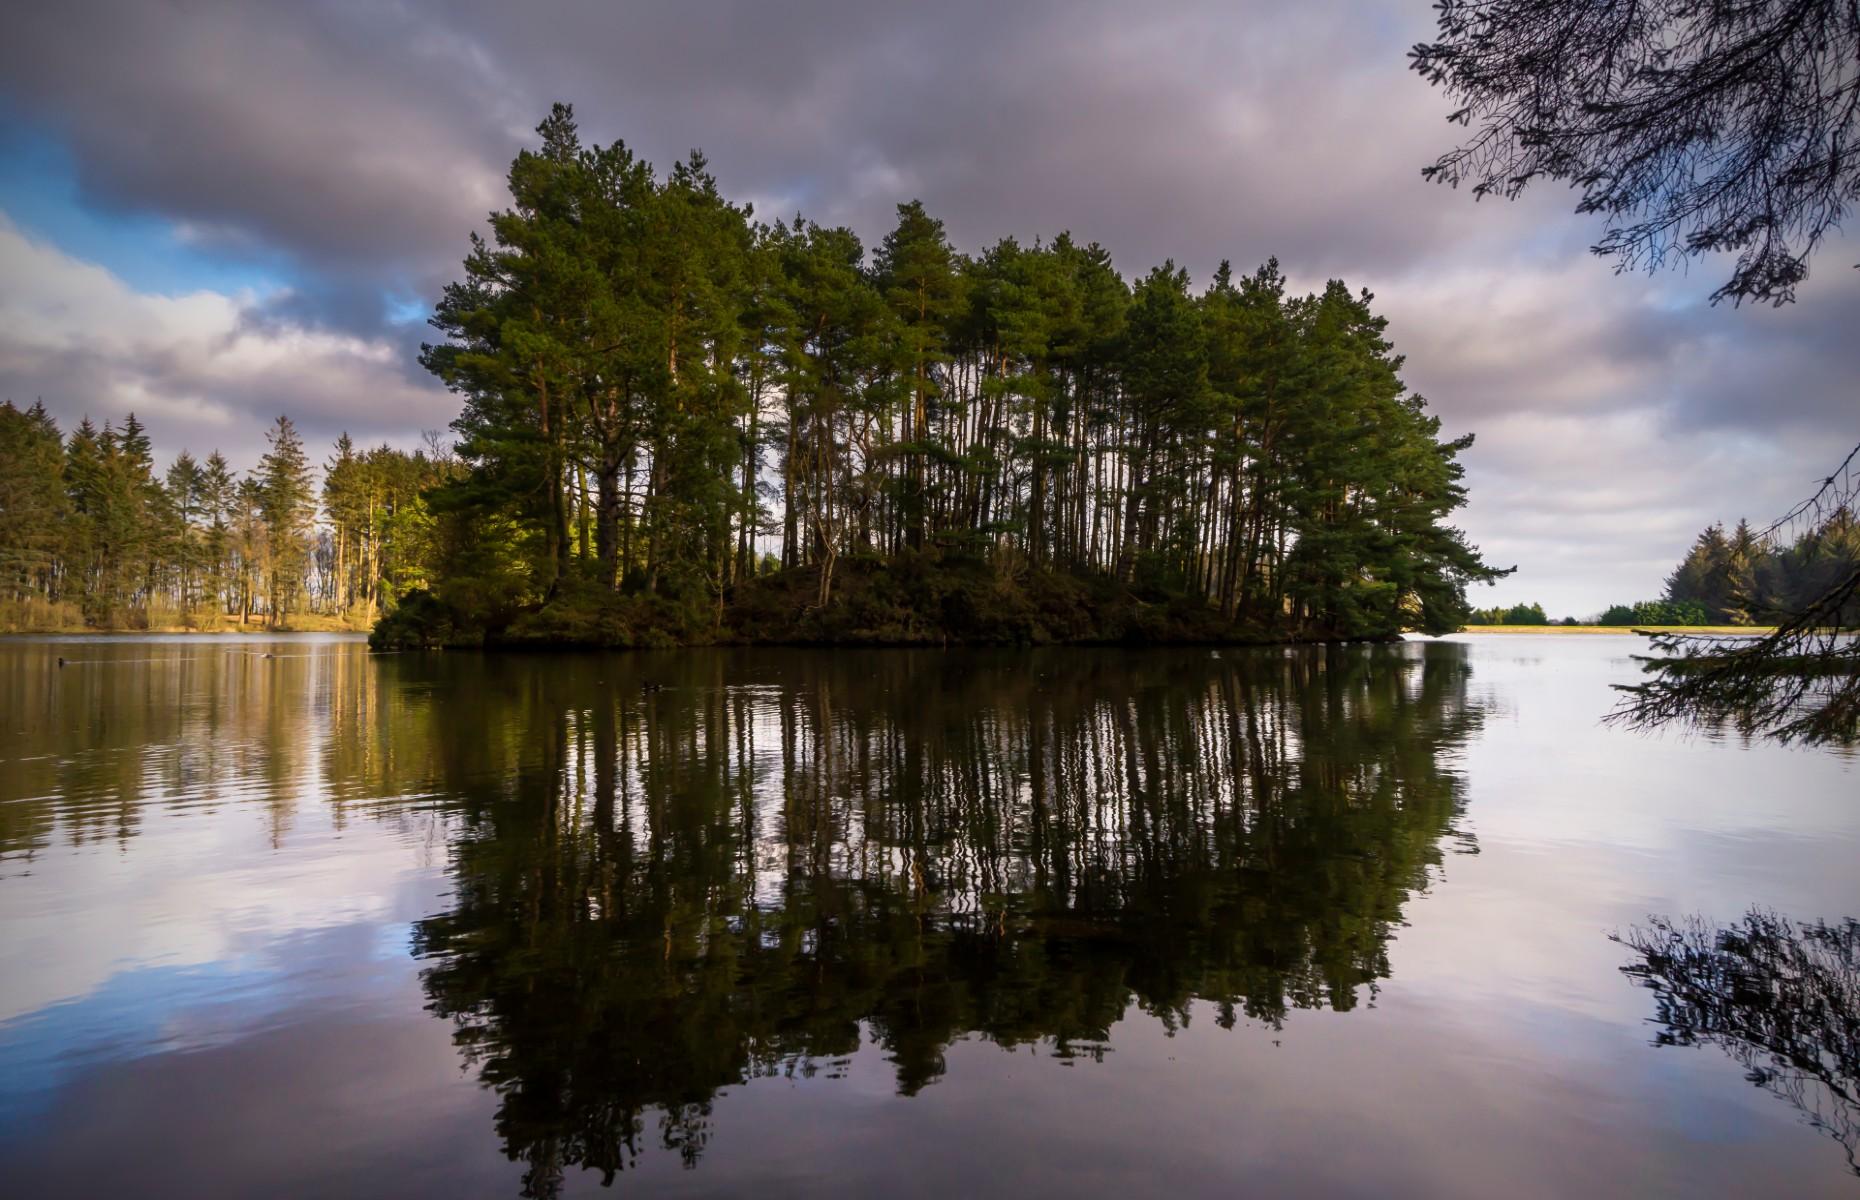 Beescraig Loch (Image: Dougie Milne Photography/Shutterstock)